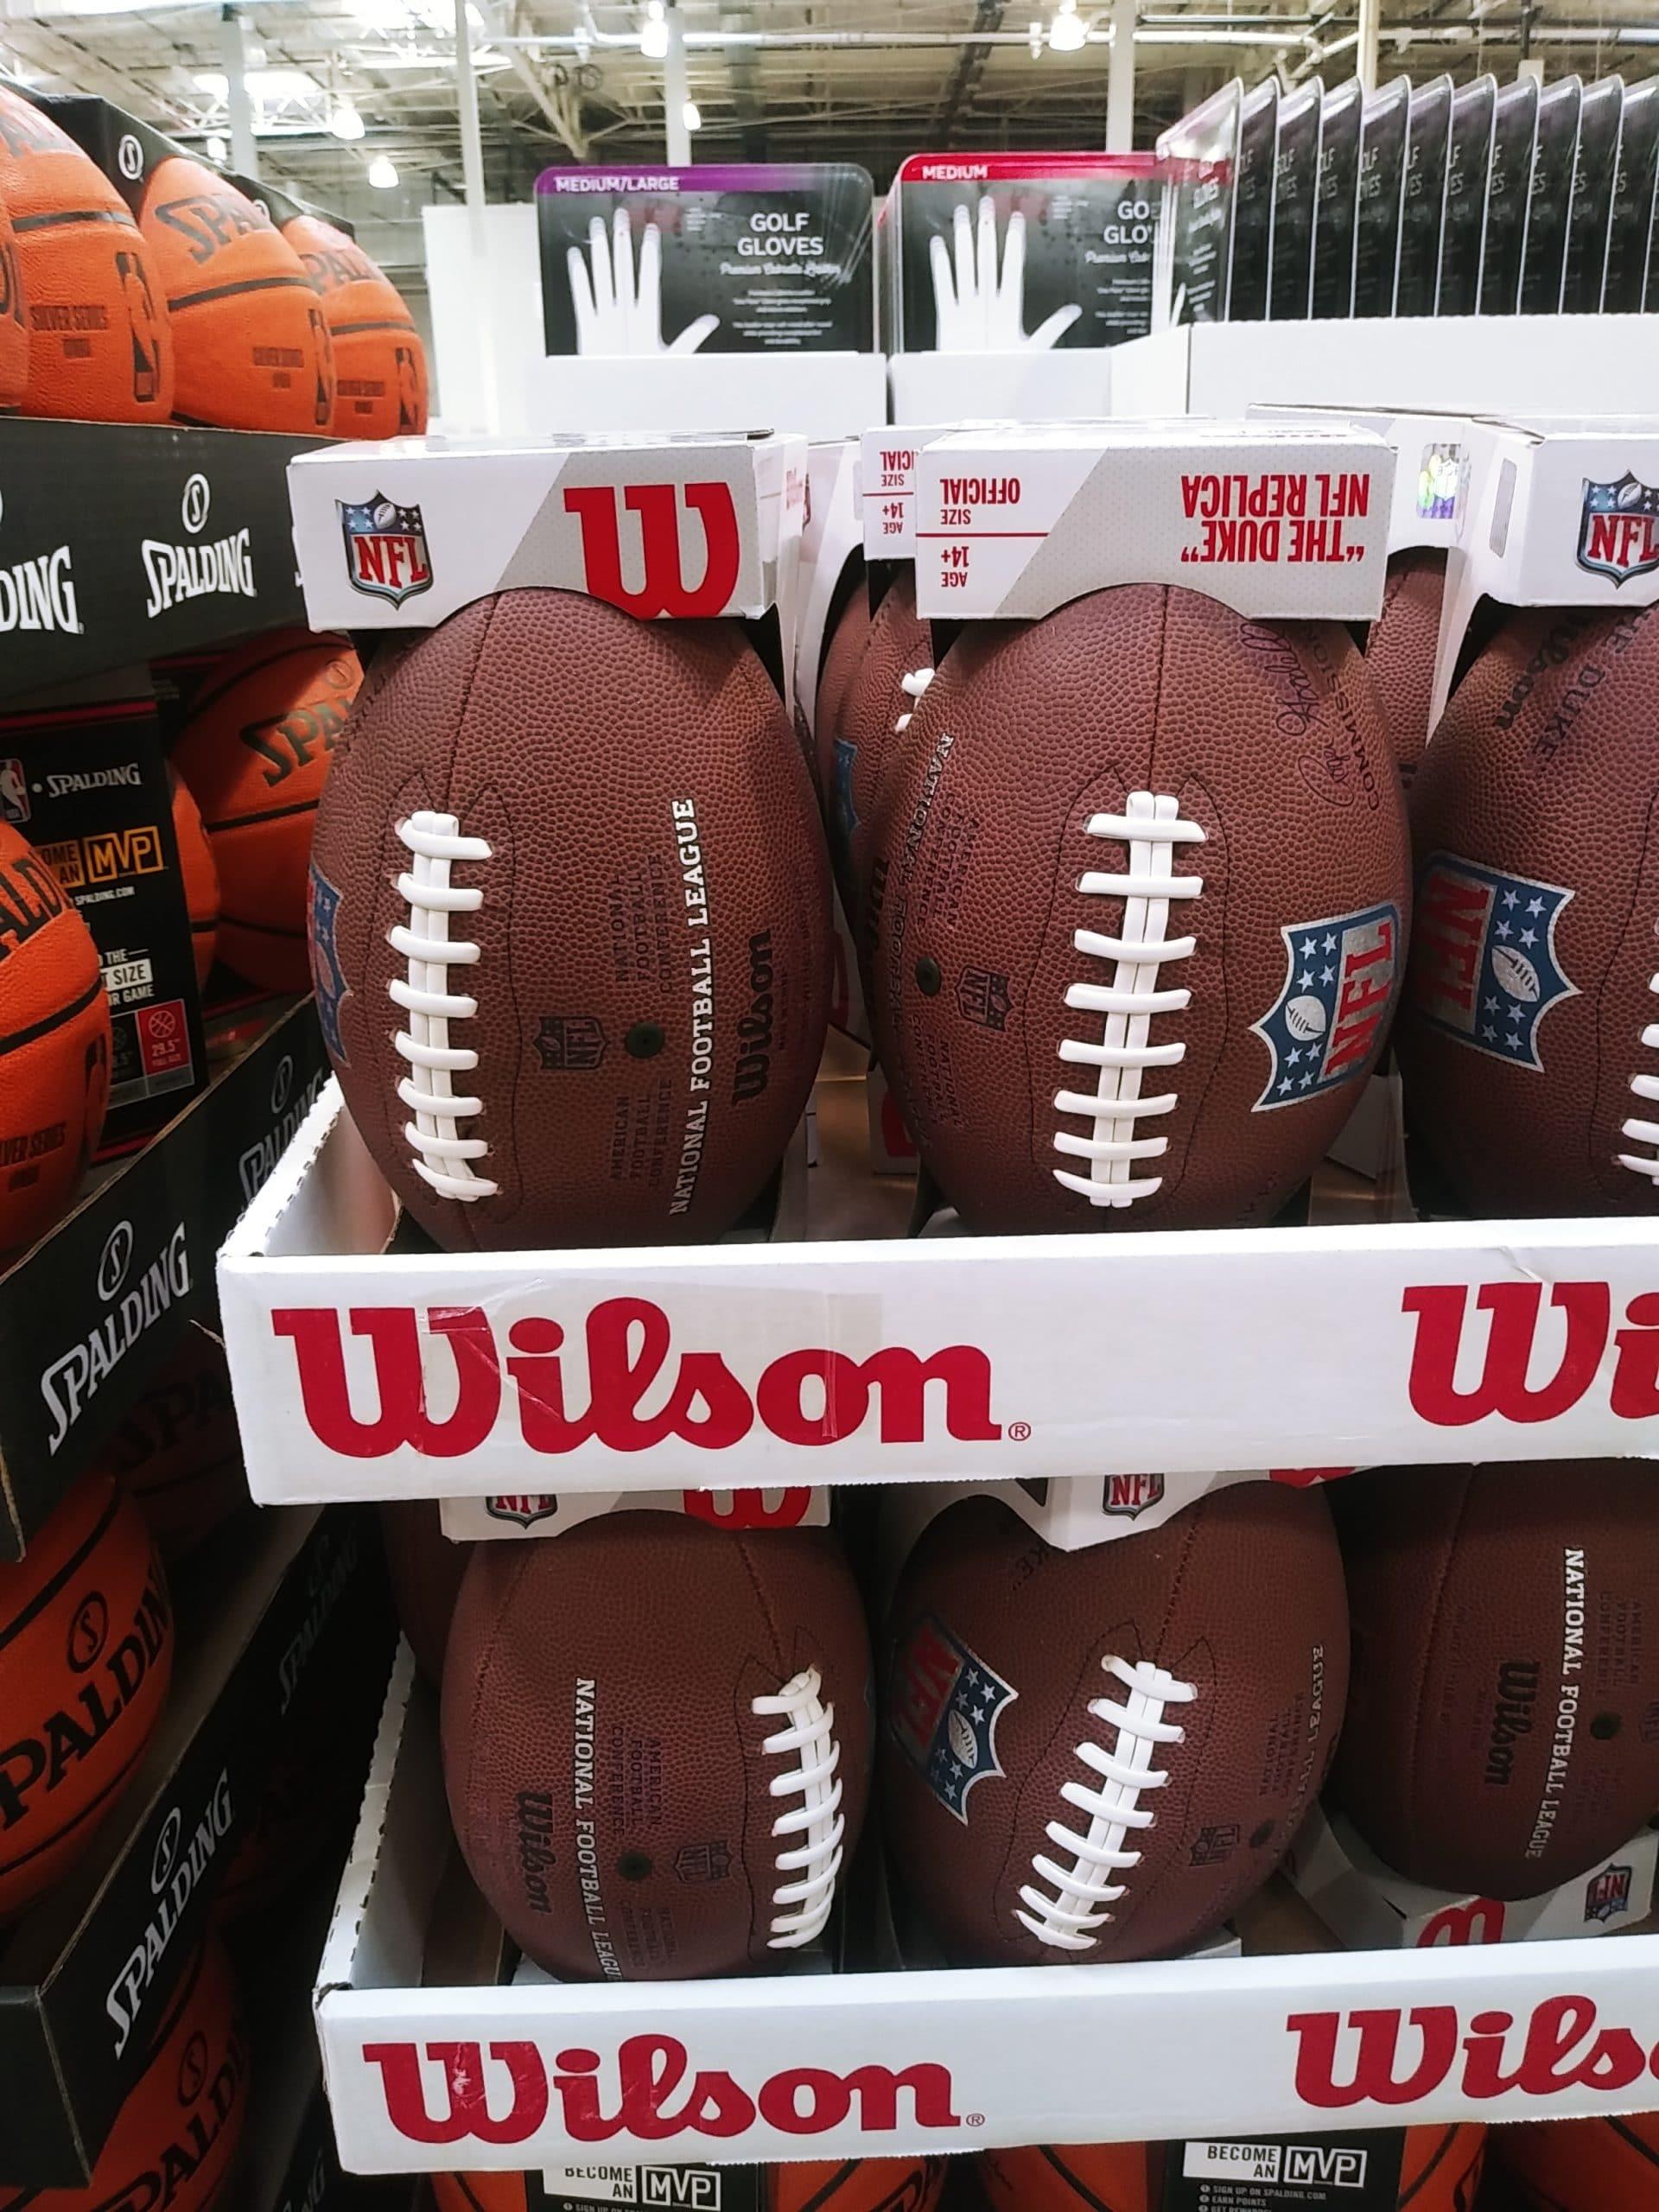 Footballs and Basketballs Under $20 at Costco